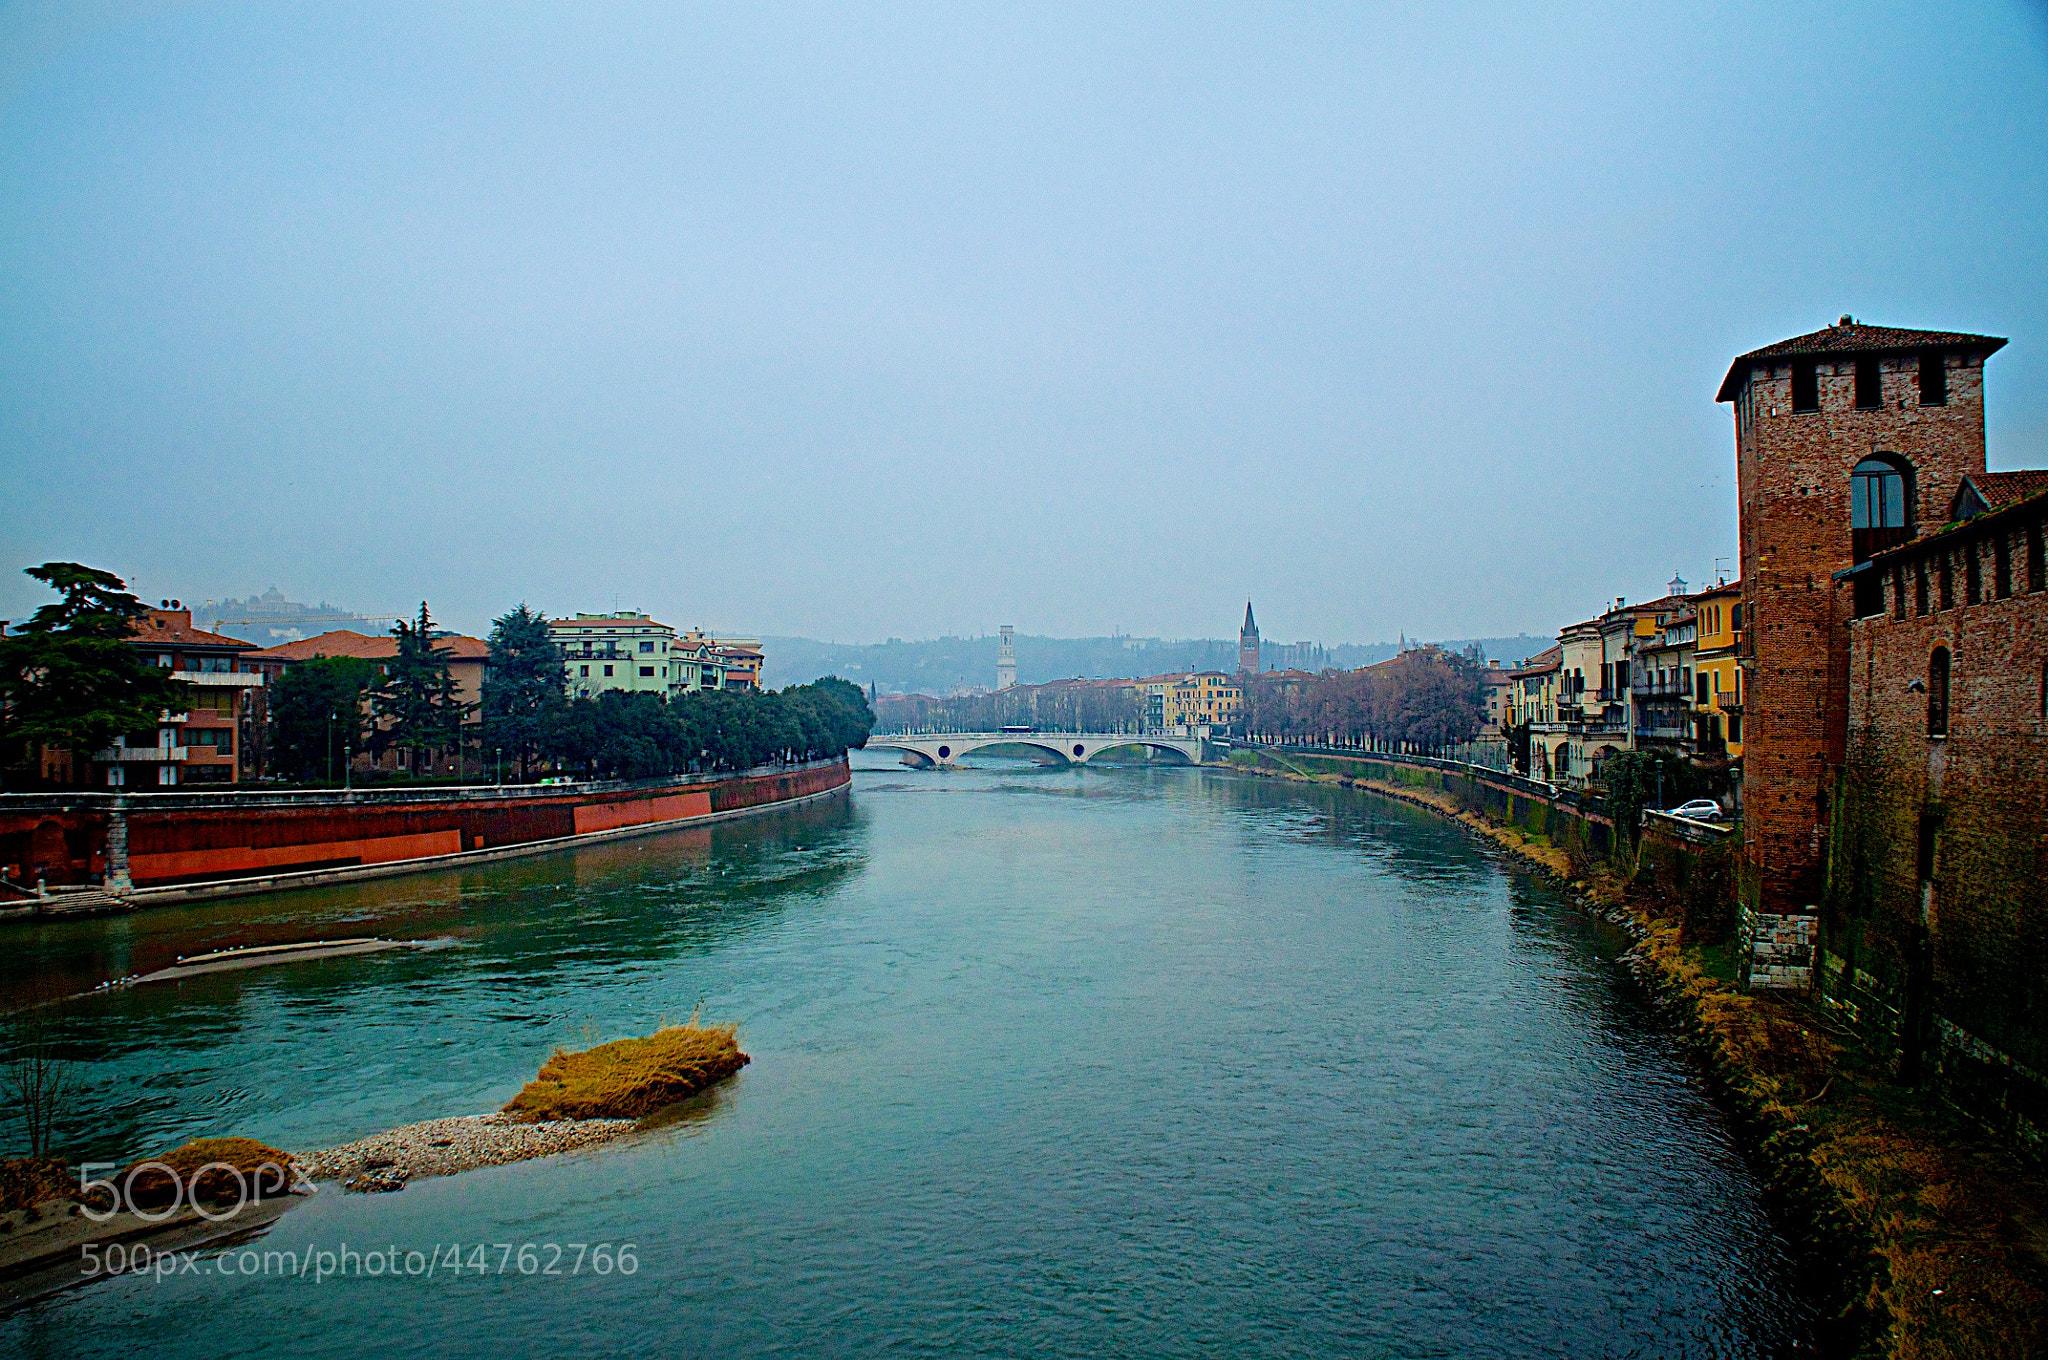 Photograph Verona by Camilo Rojas on 500px